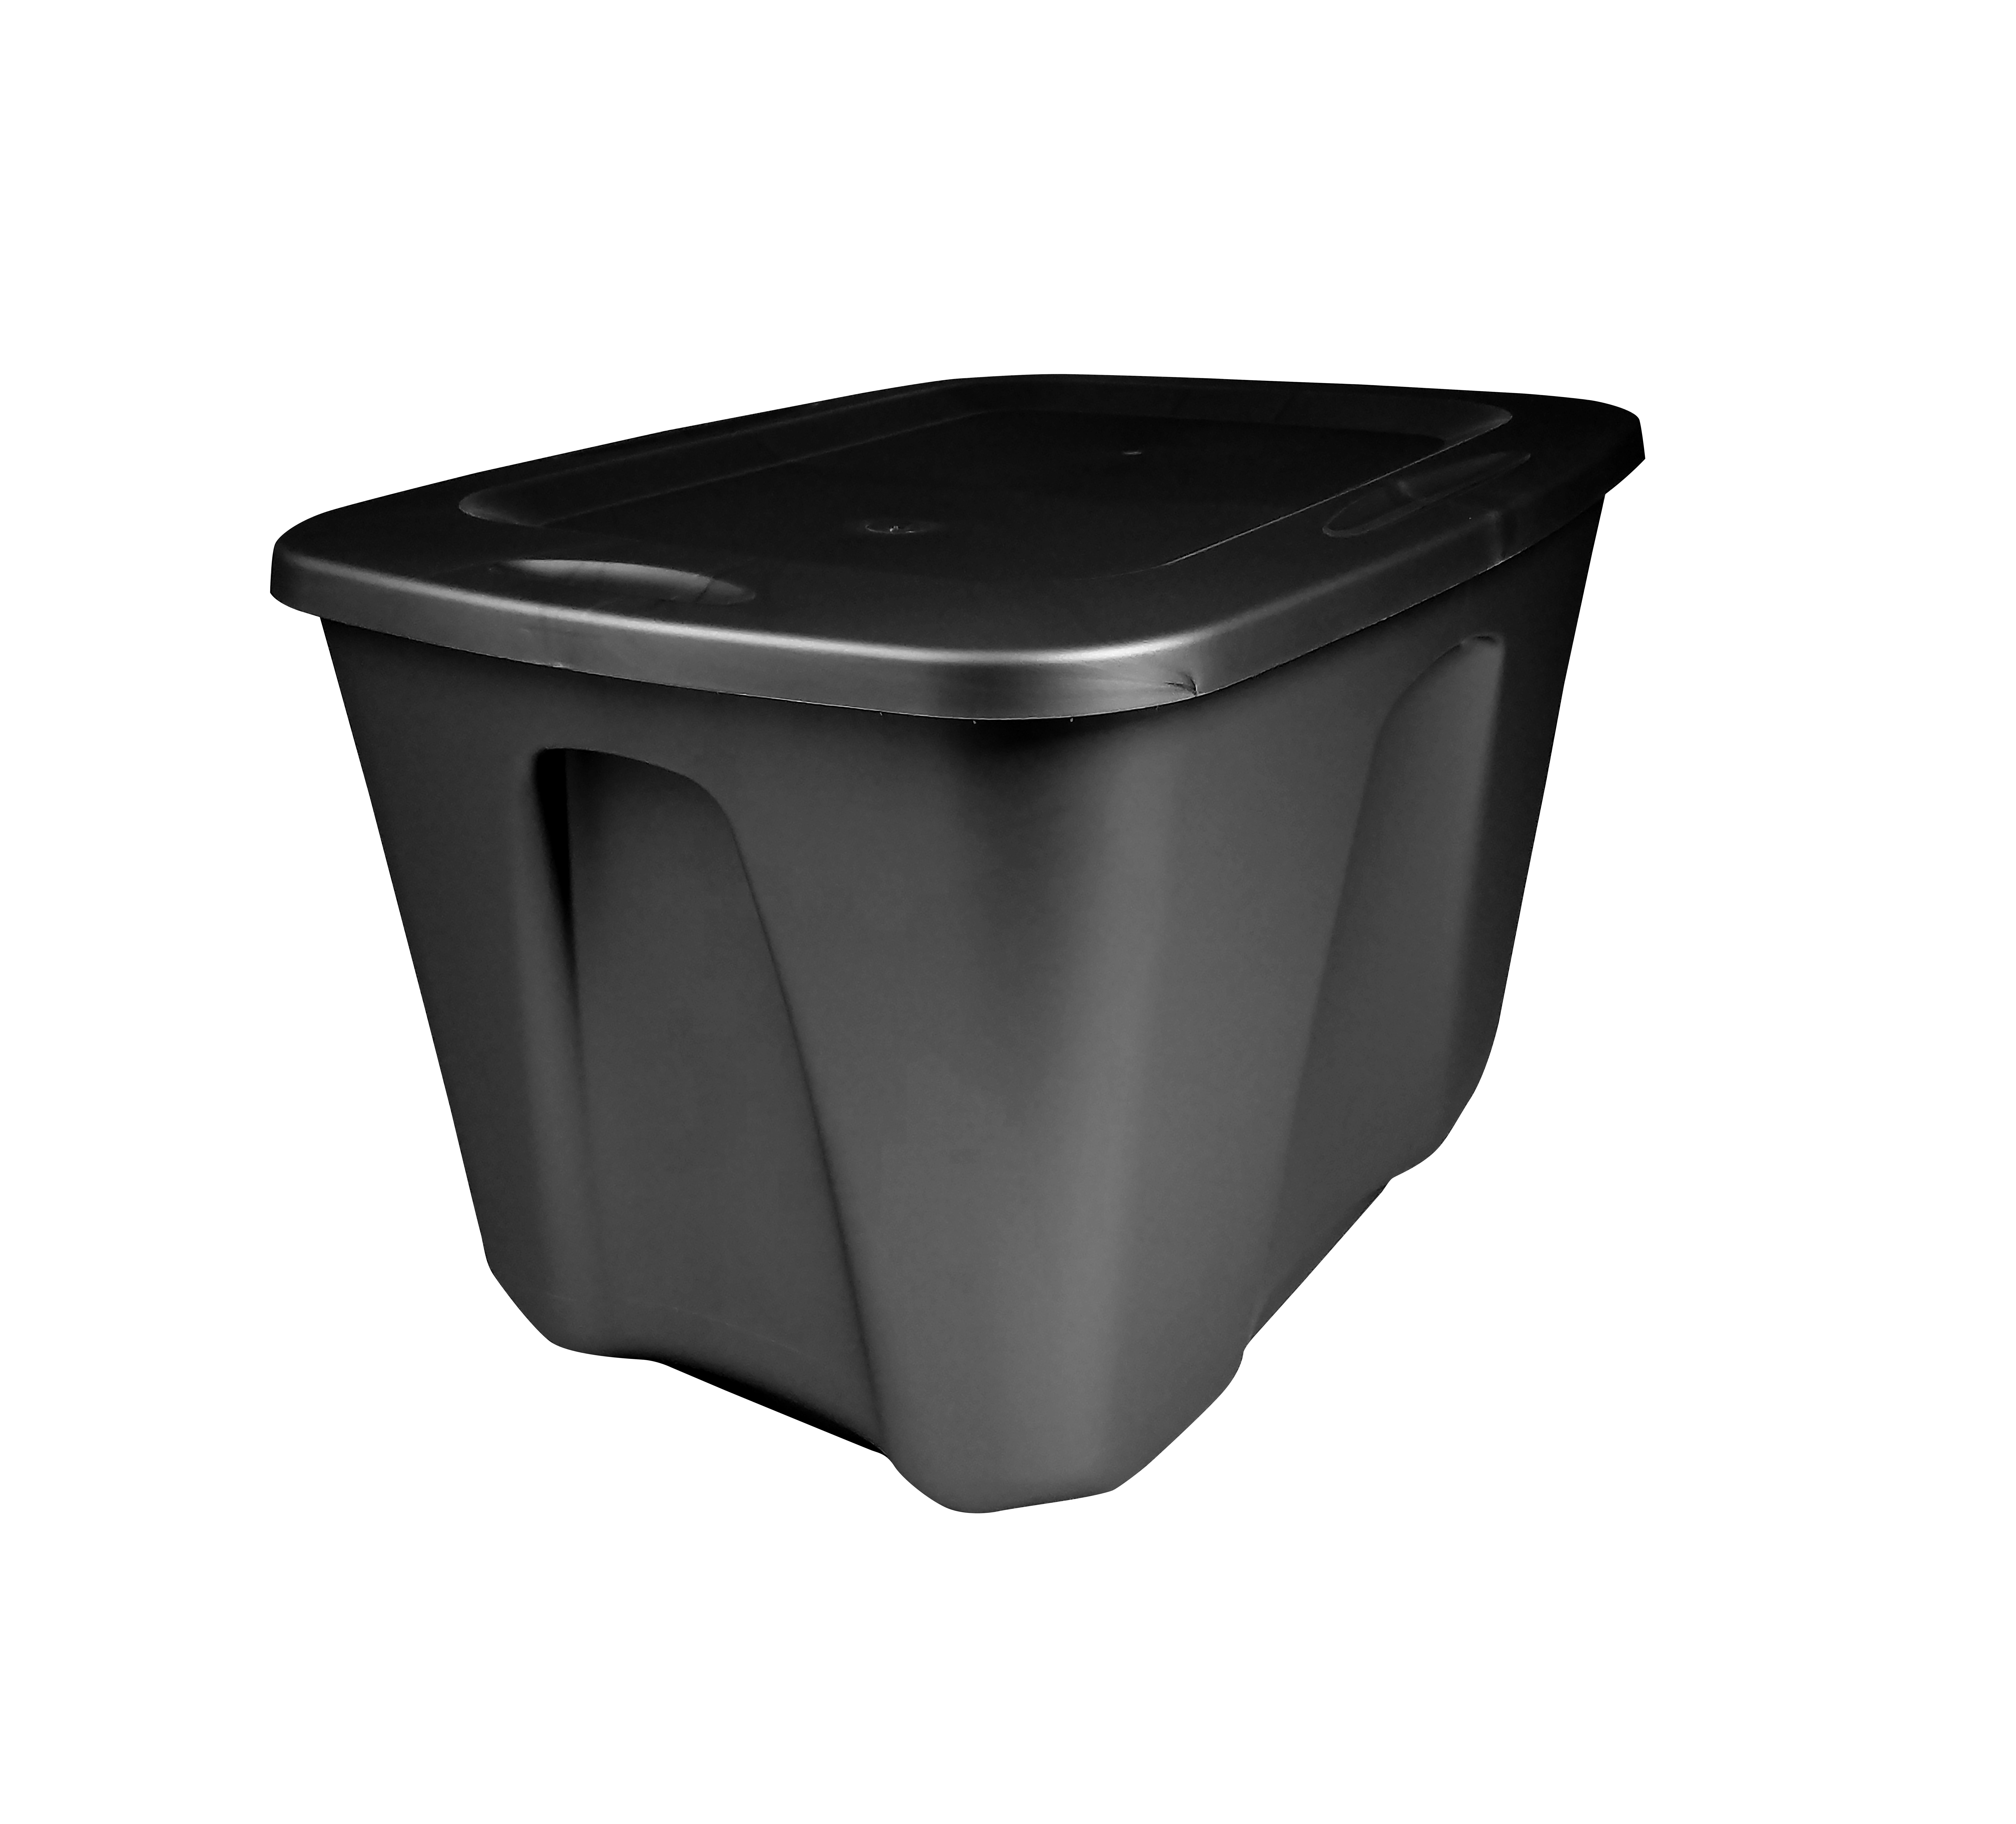 Plastic Heavy Duty Storage Tote Box 15 Gallon Black With Blue Snap